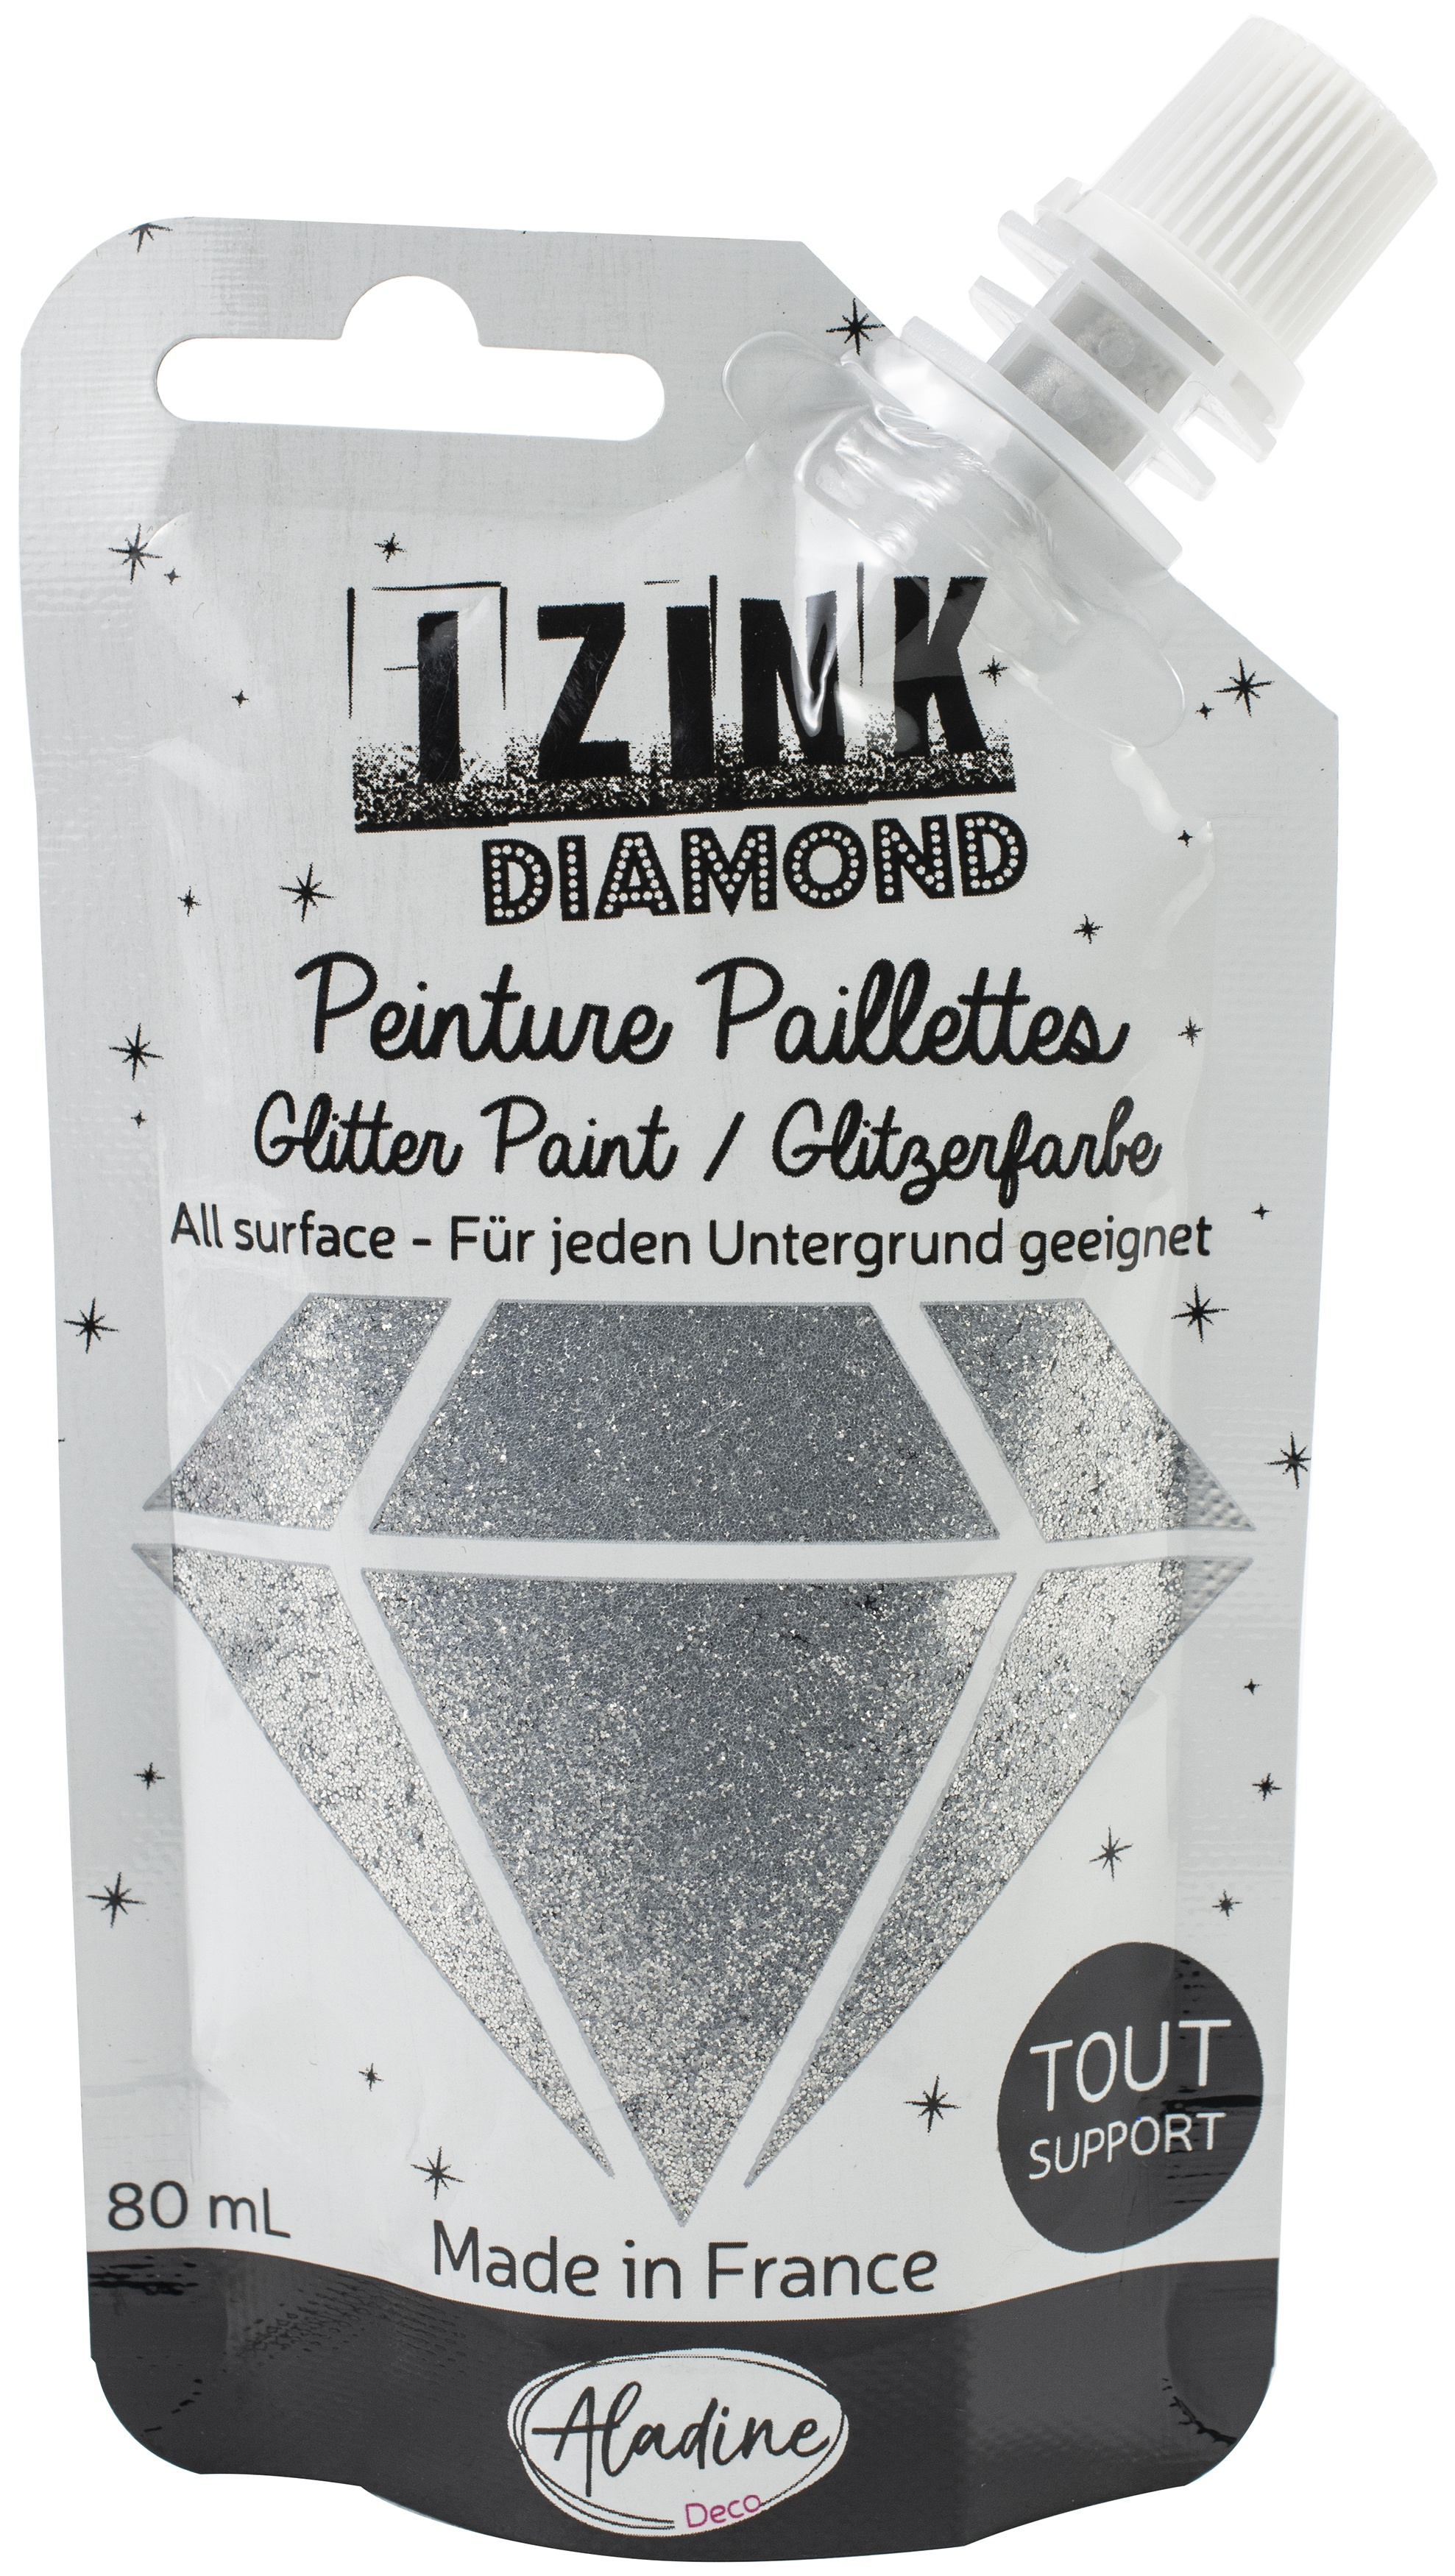 IZINK Diamond Glitter Paint - Argente   Silver